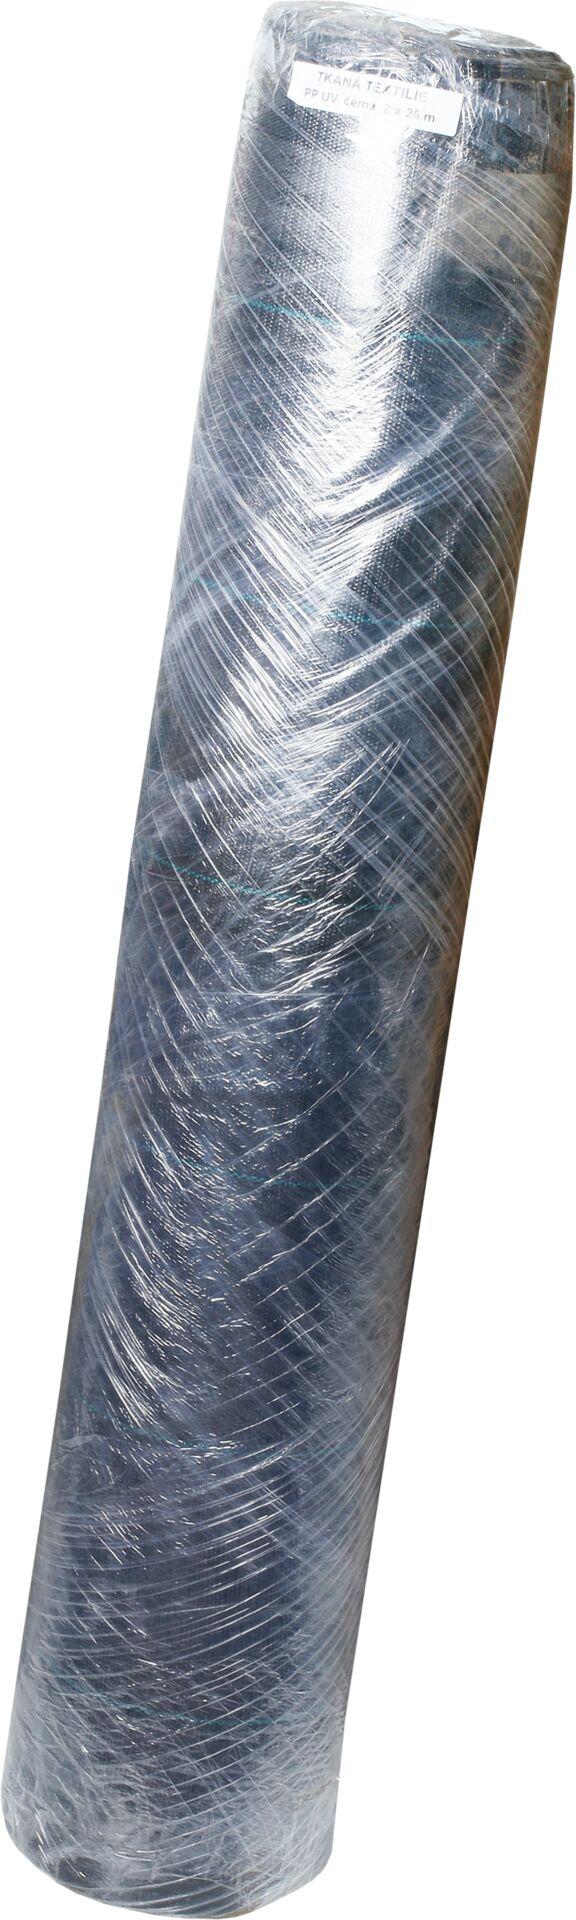 Tkaná textilie 90g - 2 x 25 m černá - 1 rol